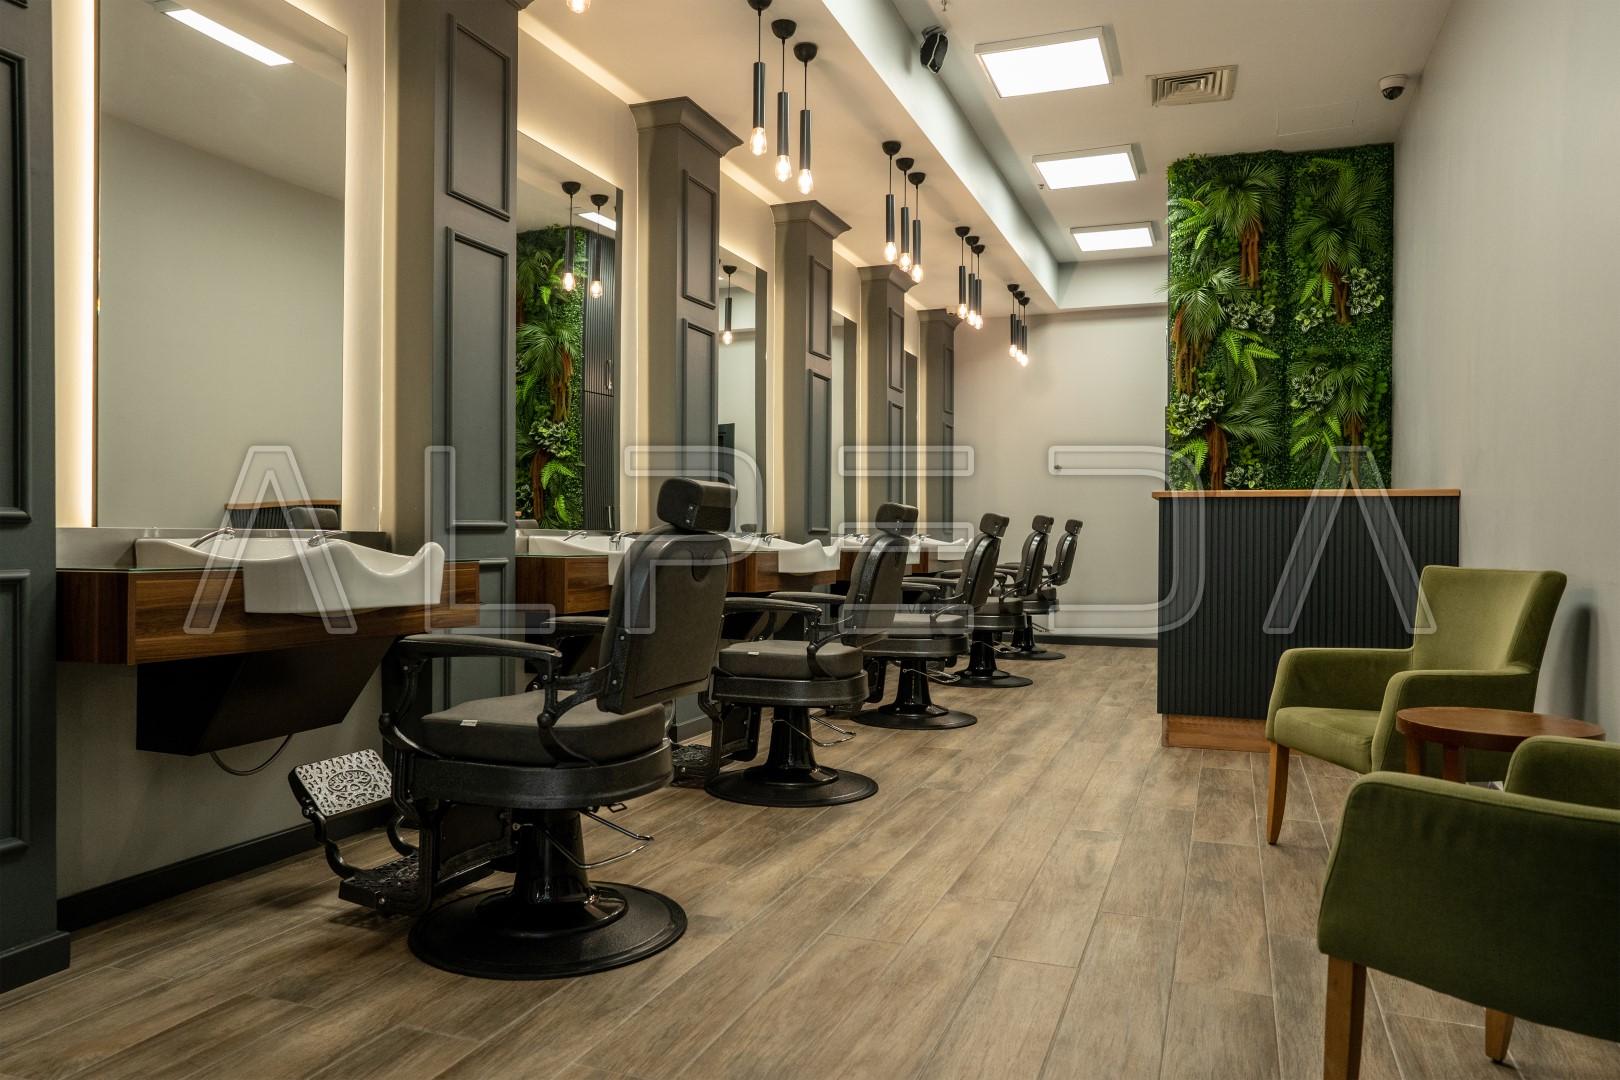 İstanbul - Salon Meet